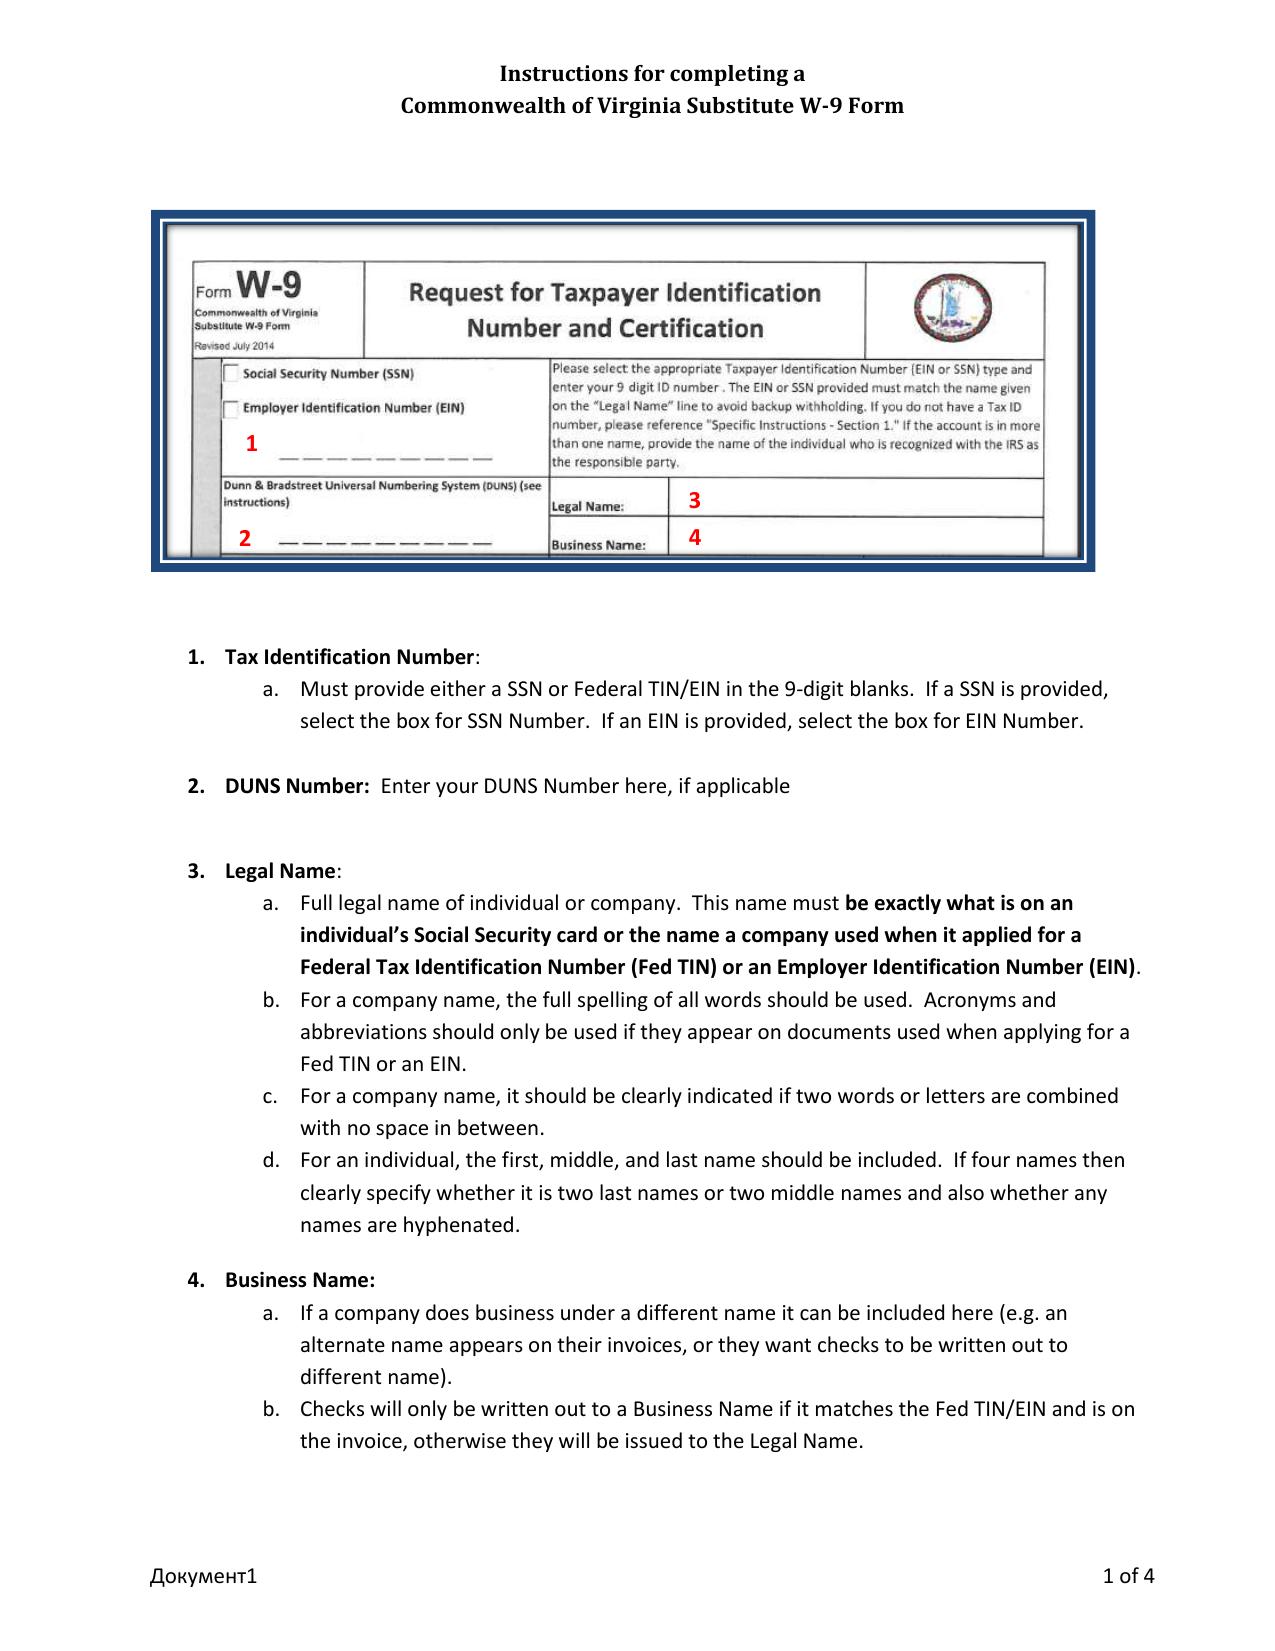 W 9 Instructions